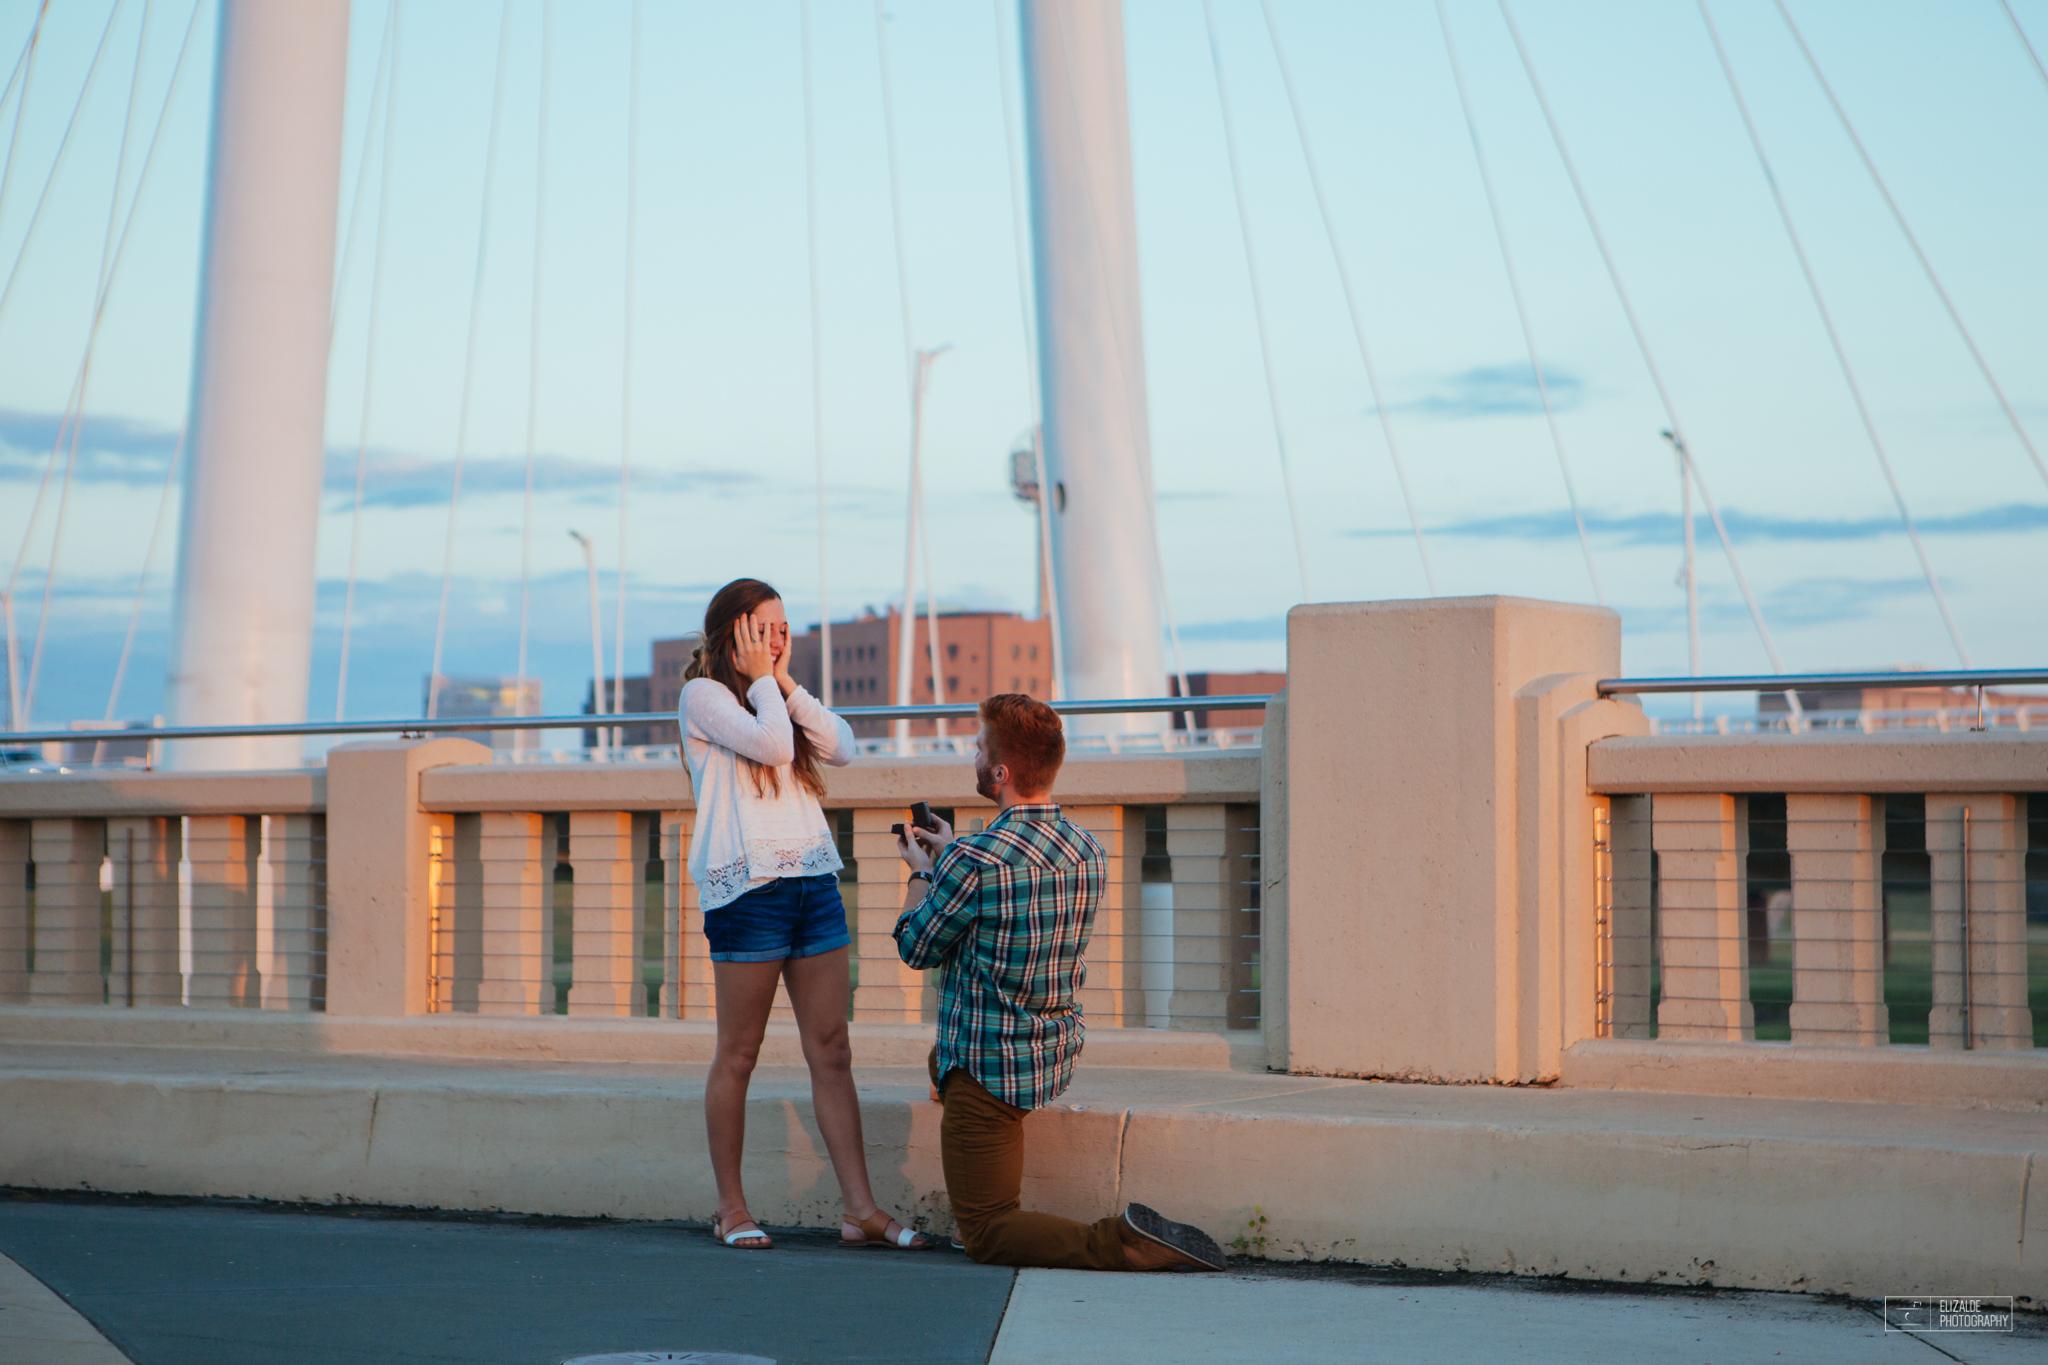 Proposal_DFW Wedding Photographer_Dallas Photographer_Elizalde Photography_margaret hunt hill bridge (3 of 21).jpg